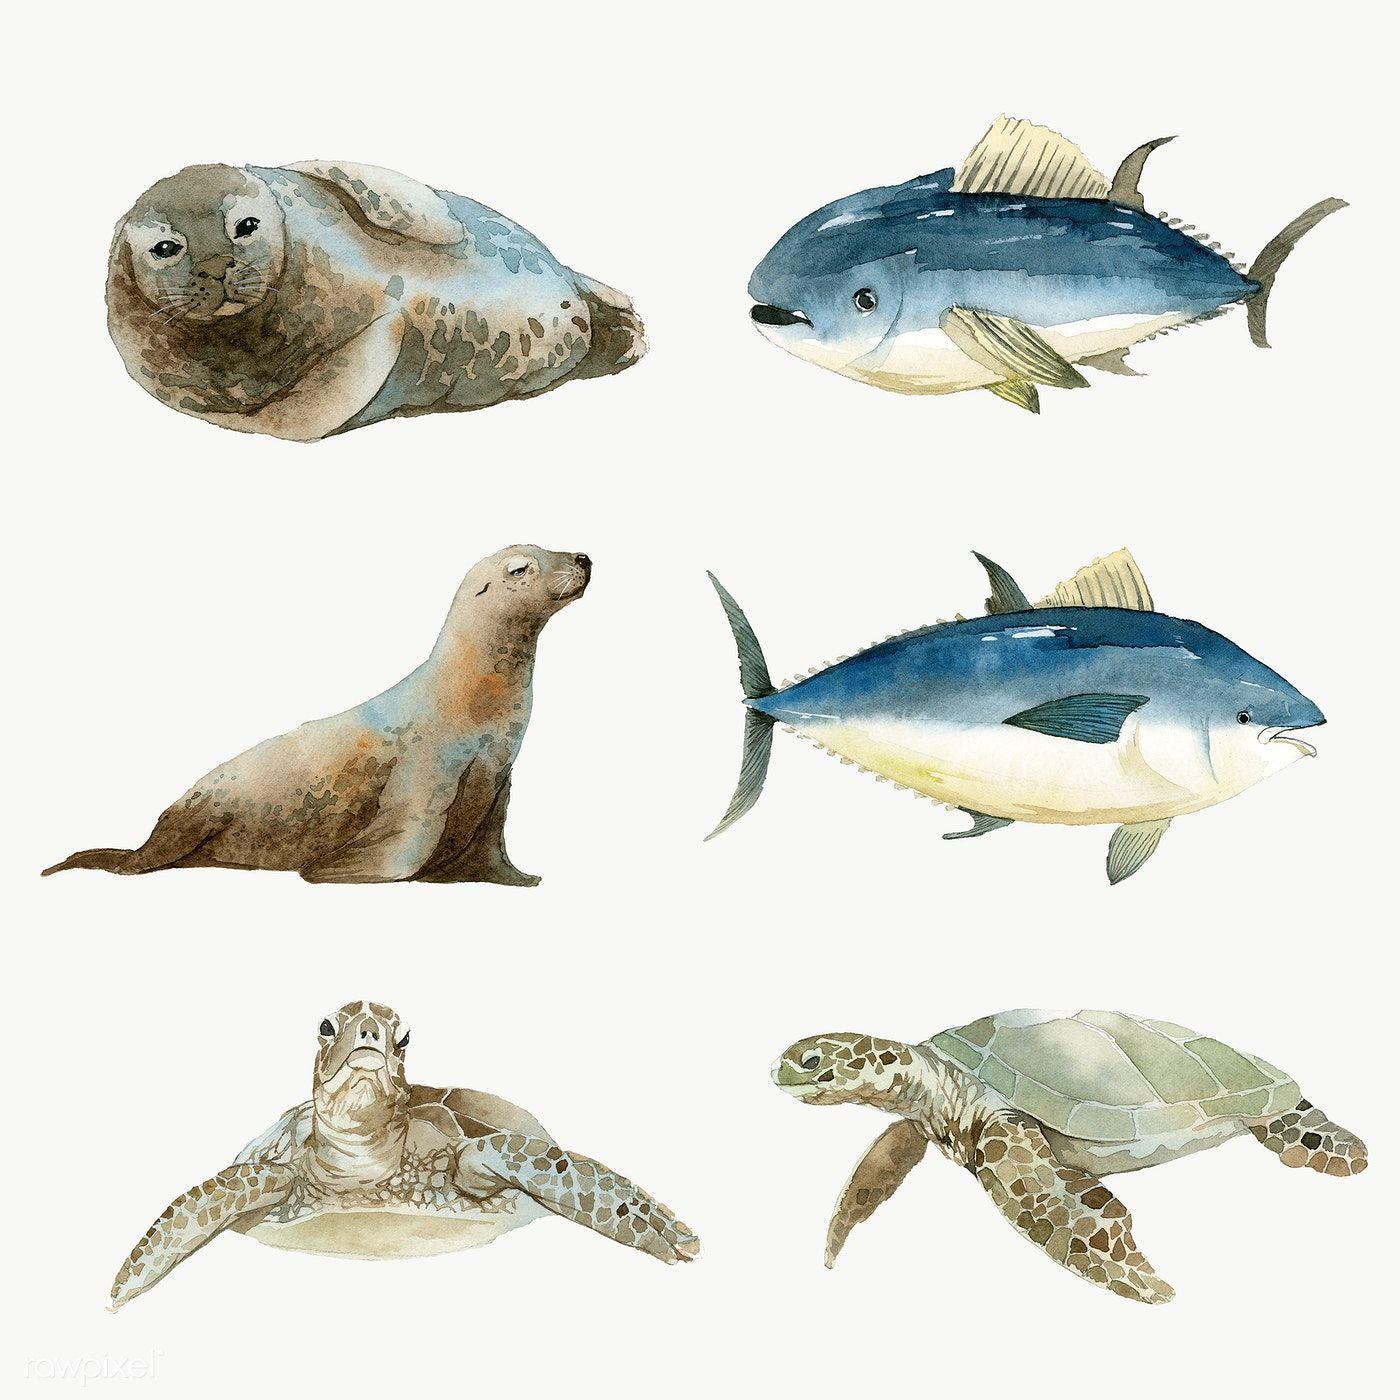 Marine Life Set Painted In Watercolor Transparent Png Premium Image By Rawpixel Com Niwat Animal Illustration Animal Drawings Marine Life